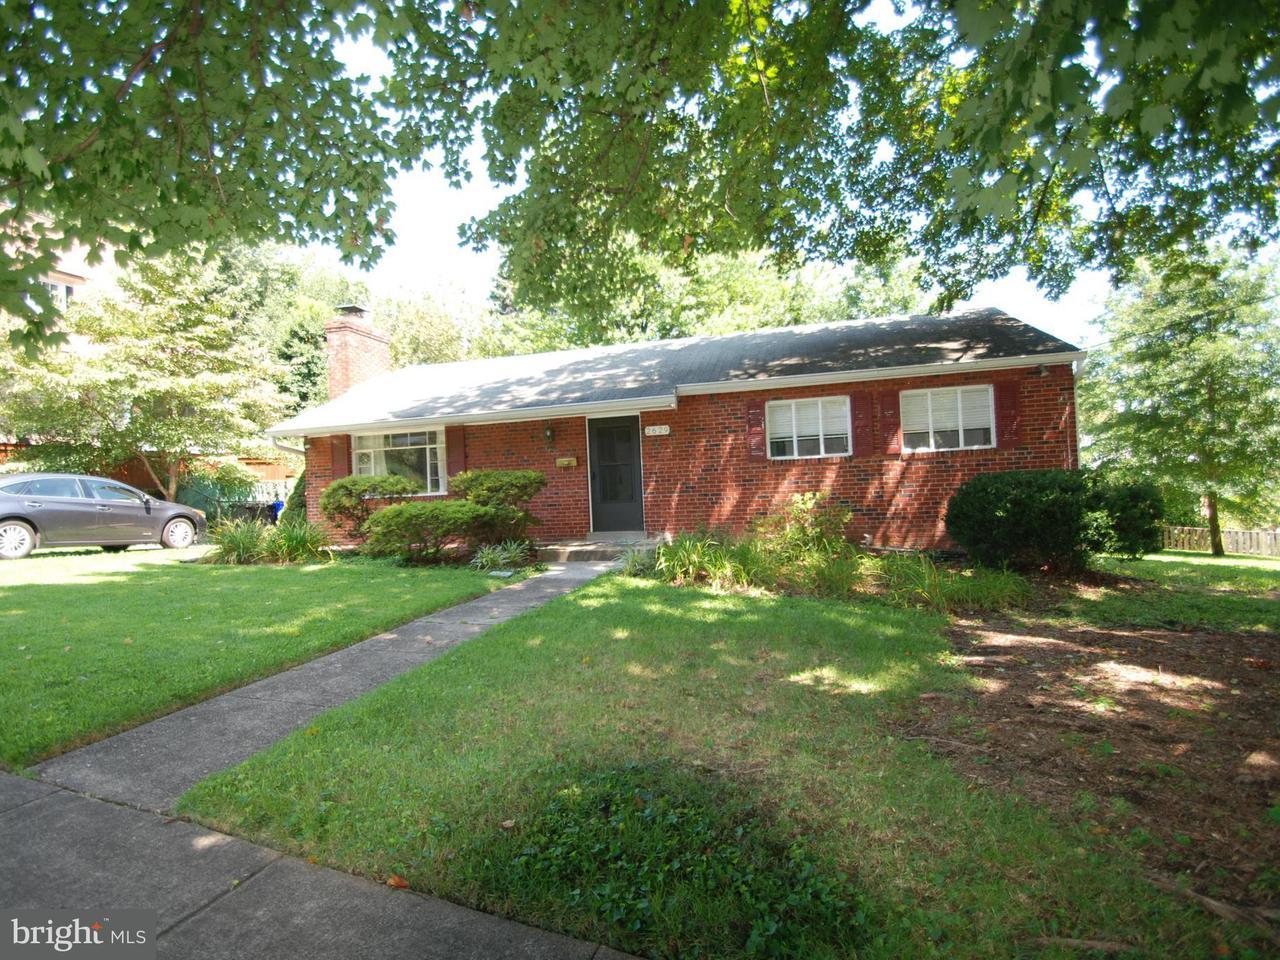 Single Family Home for Sale at 2629 RICHMOND ST N 2629 RICHMOND ST N Arlington, Virginia 22207 United States